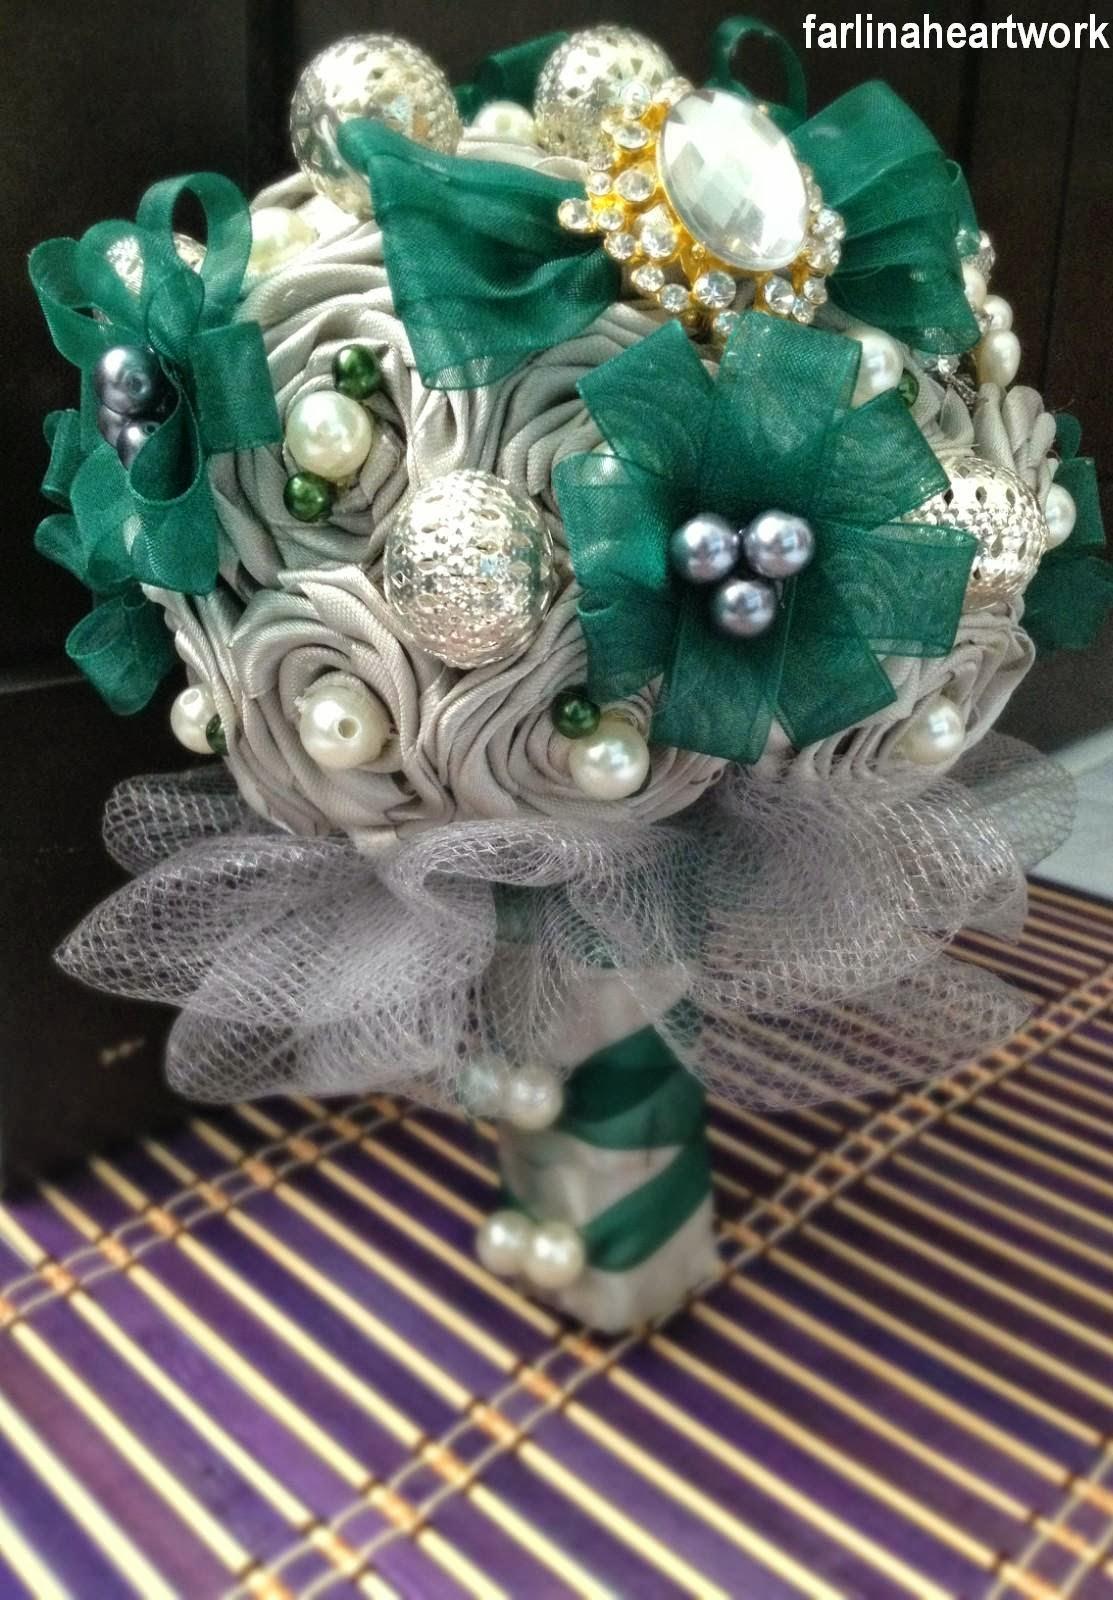 Farlina Heart Work: Wedding Theme: Emerald Green and Silver (Hand ...